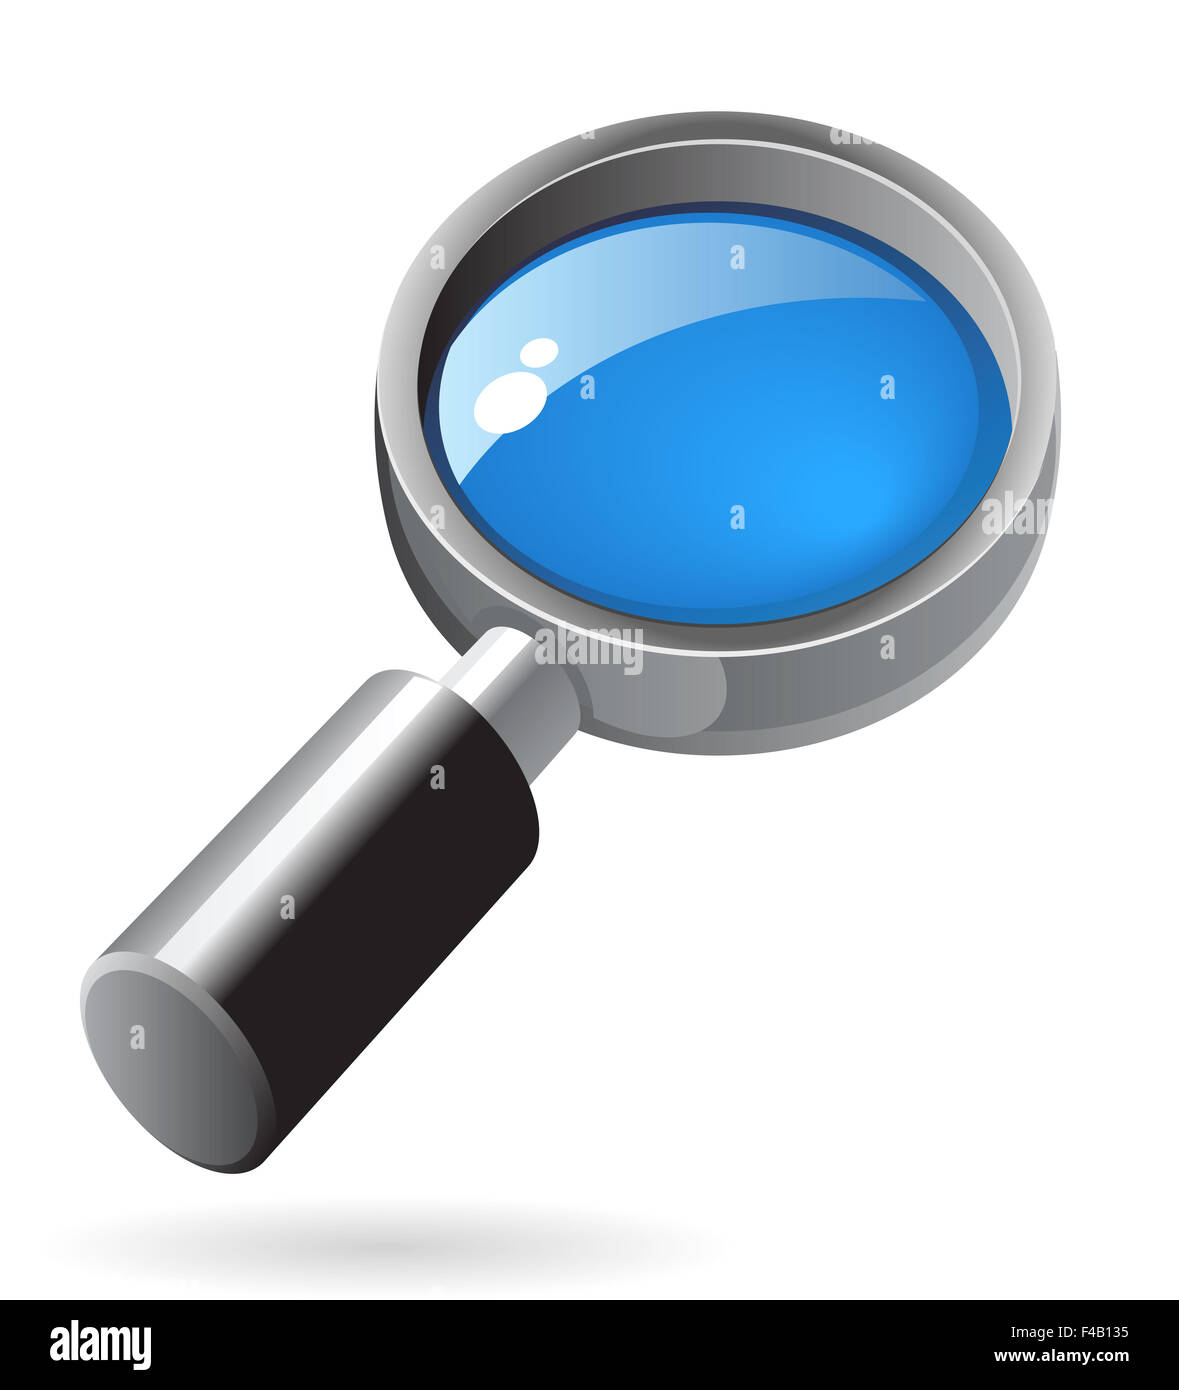 Isometric icon of lens - Stock Image